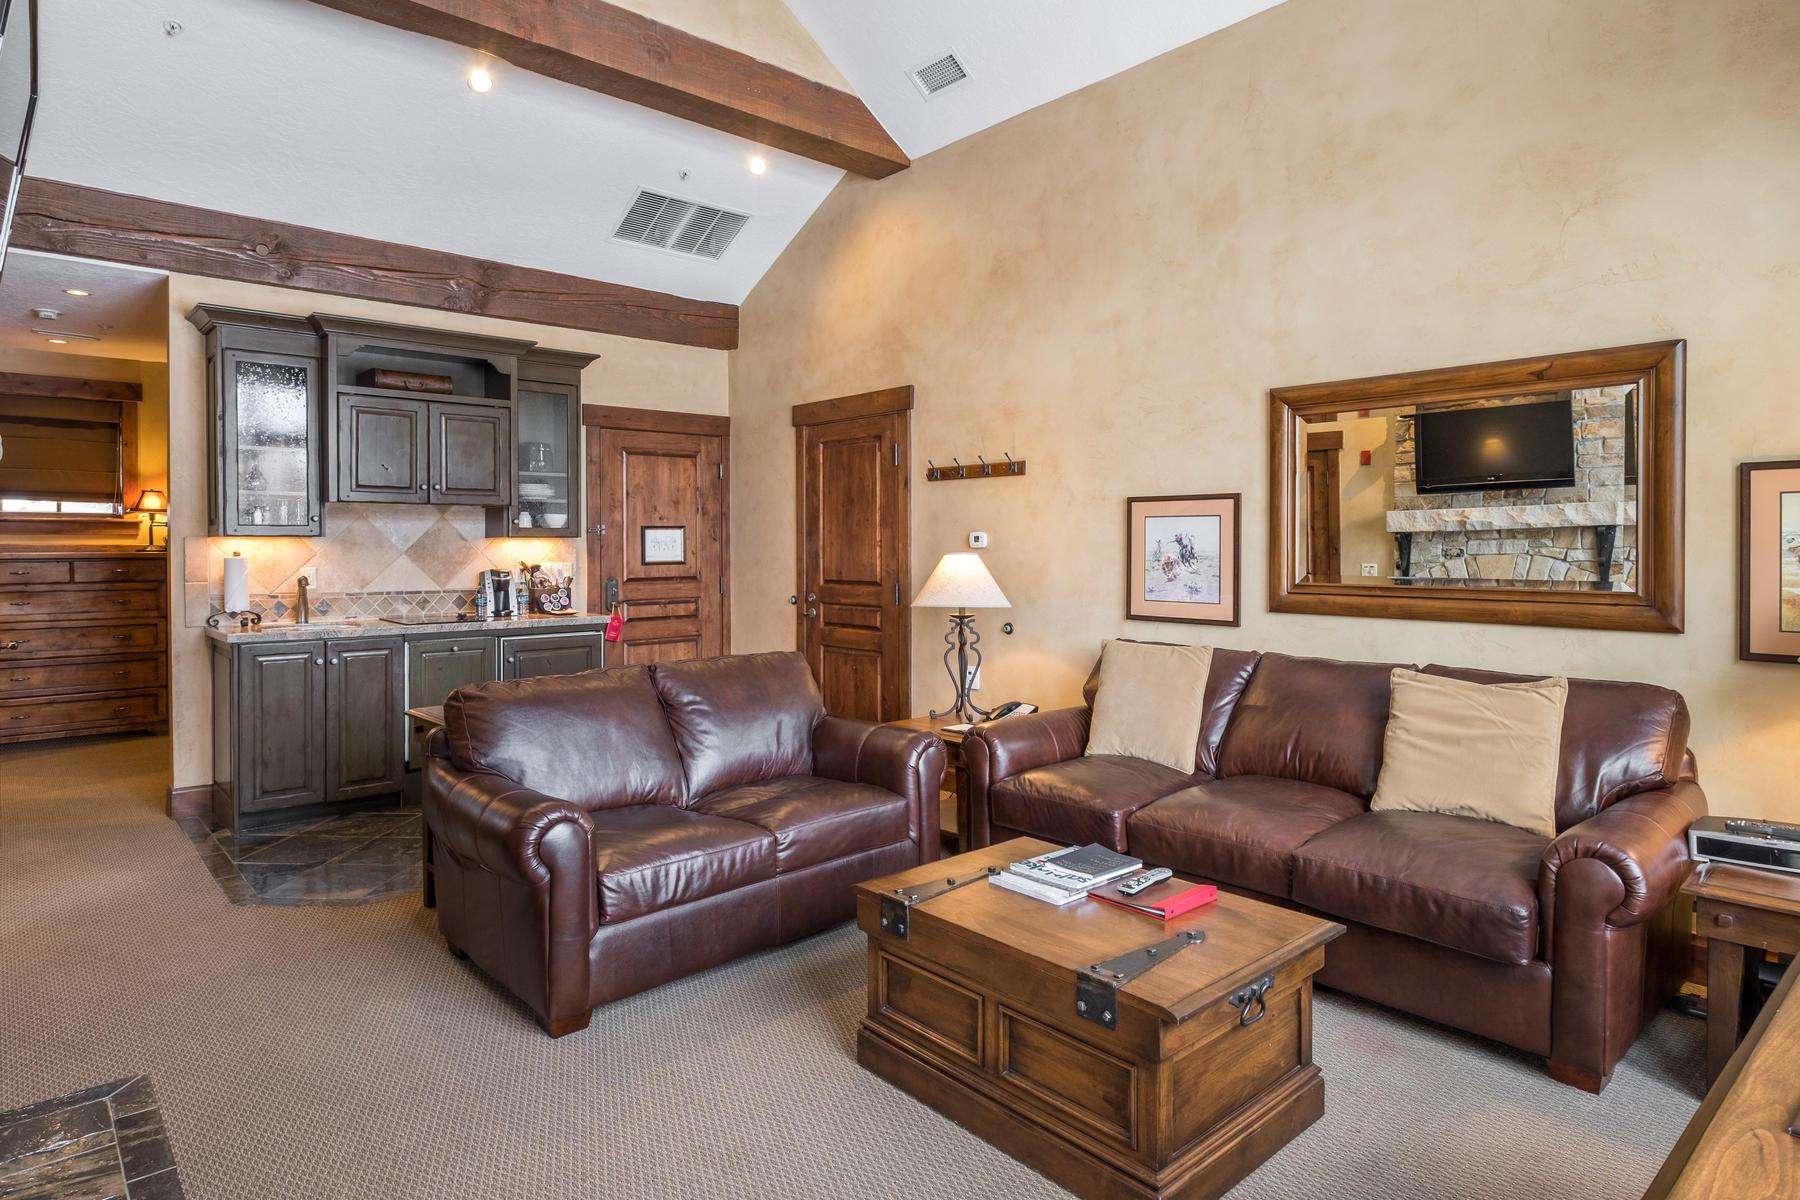 Condominium for Sale at Gorgeous Cottage Suite at Hotel Park City 2001 Park Ave #466, Park City, Utah, 84060 United States